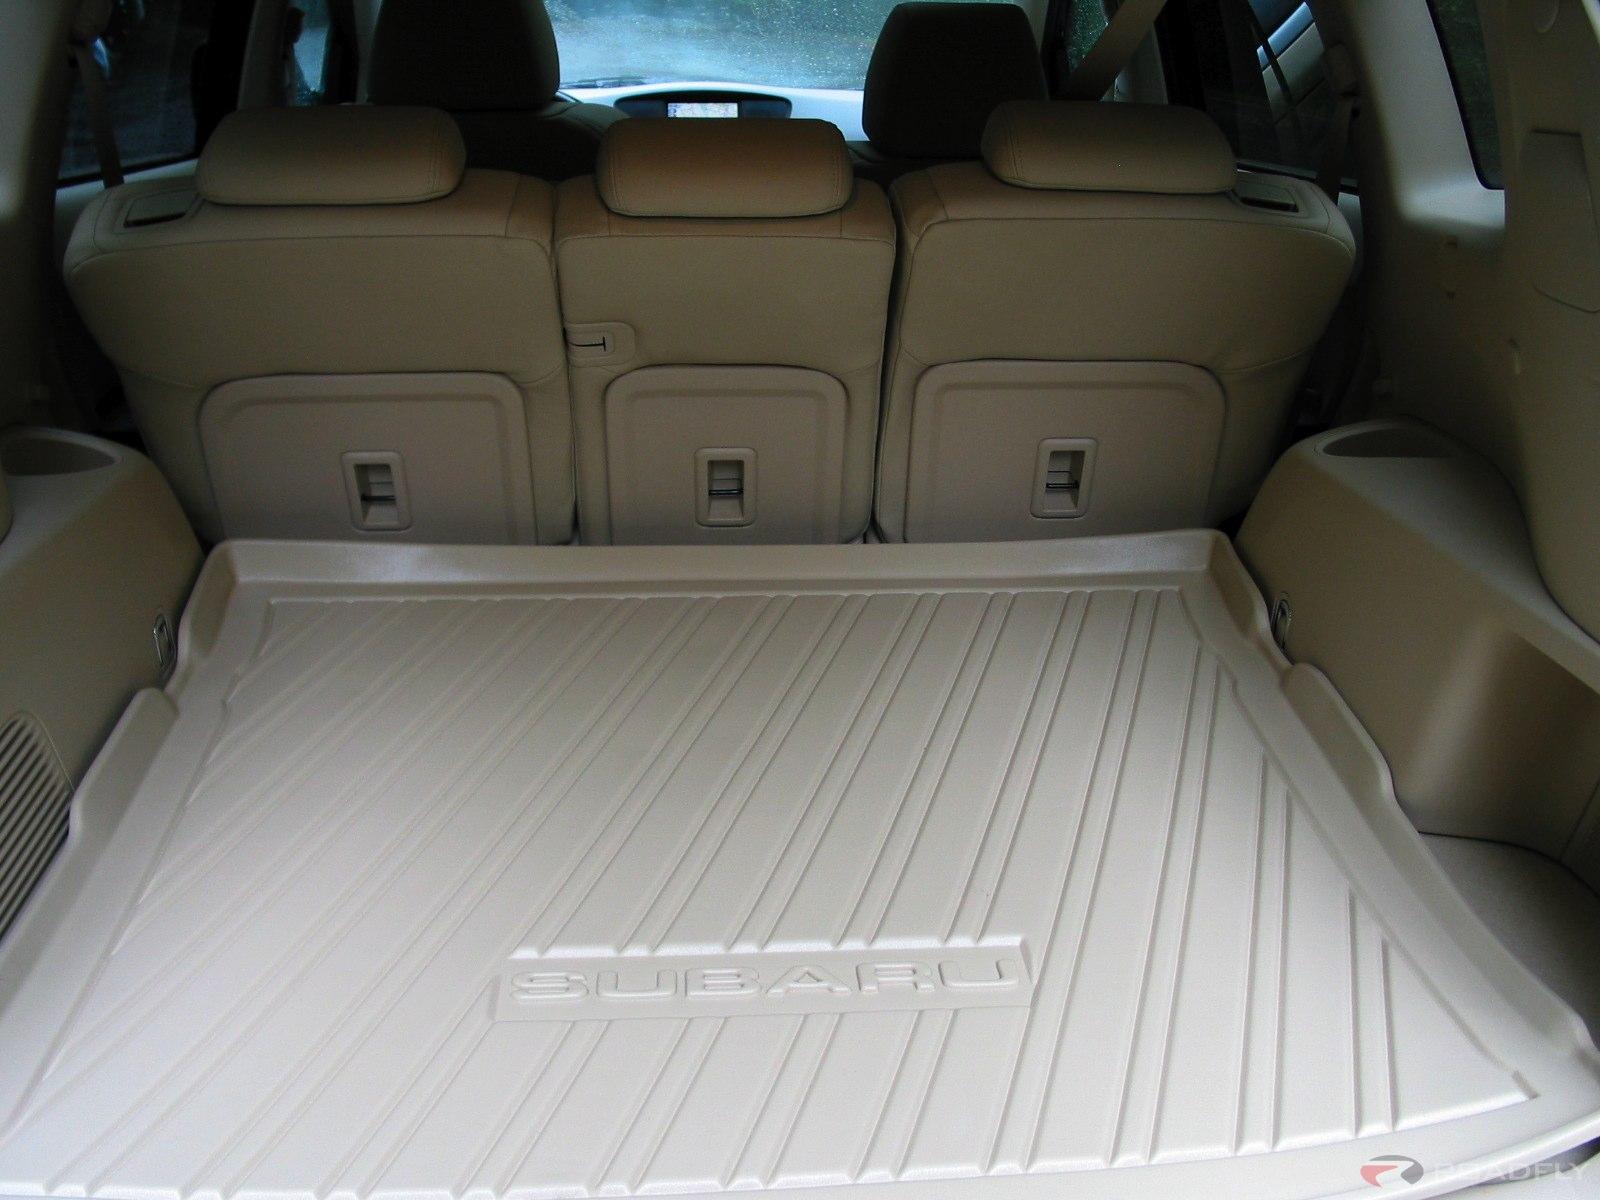 Subaru Tribeca 3.0